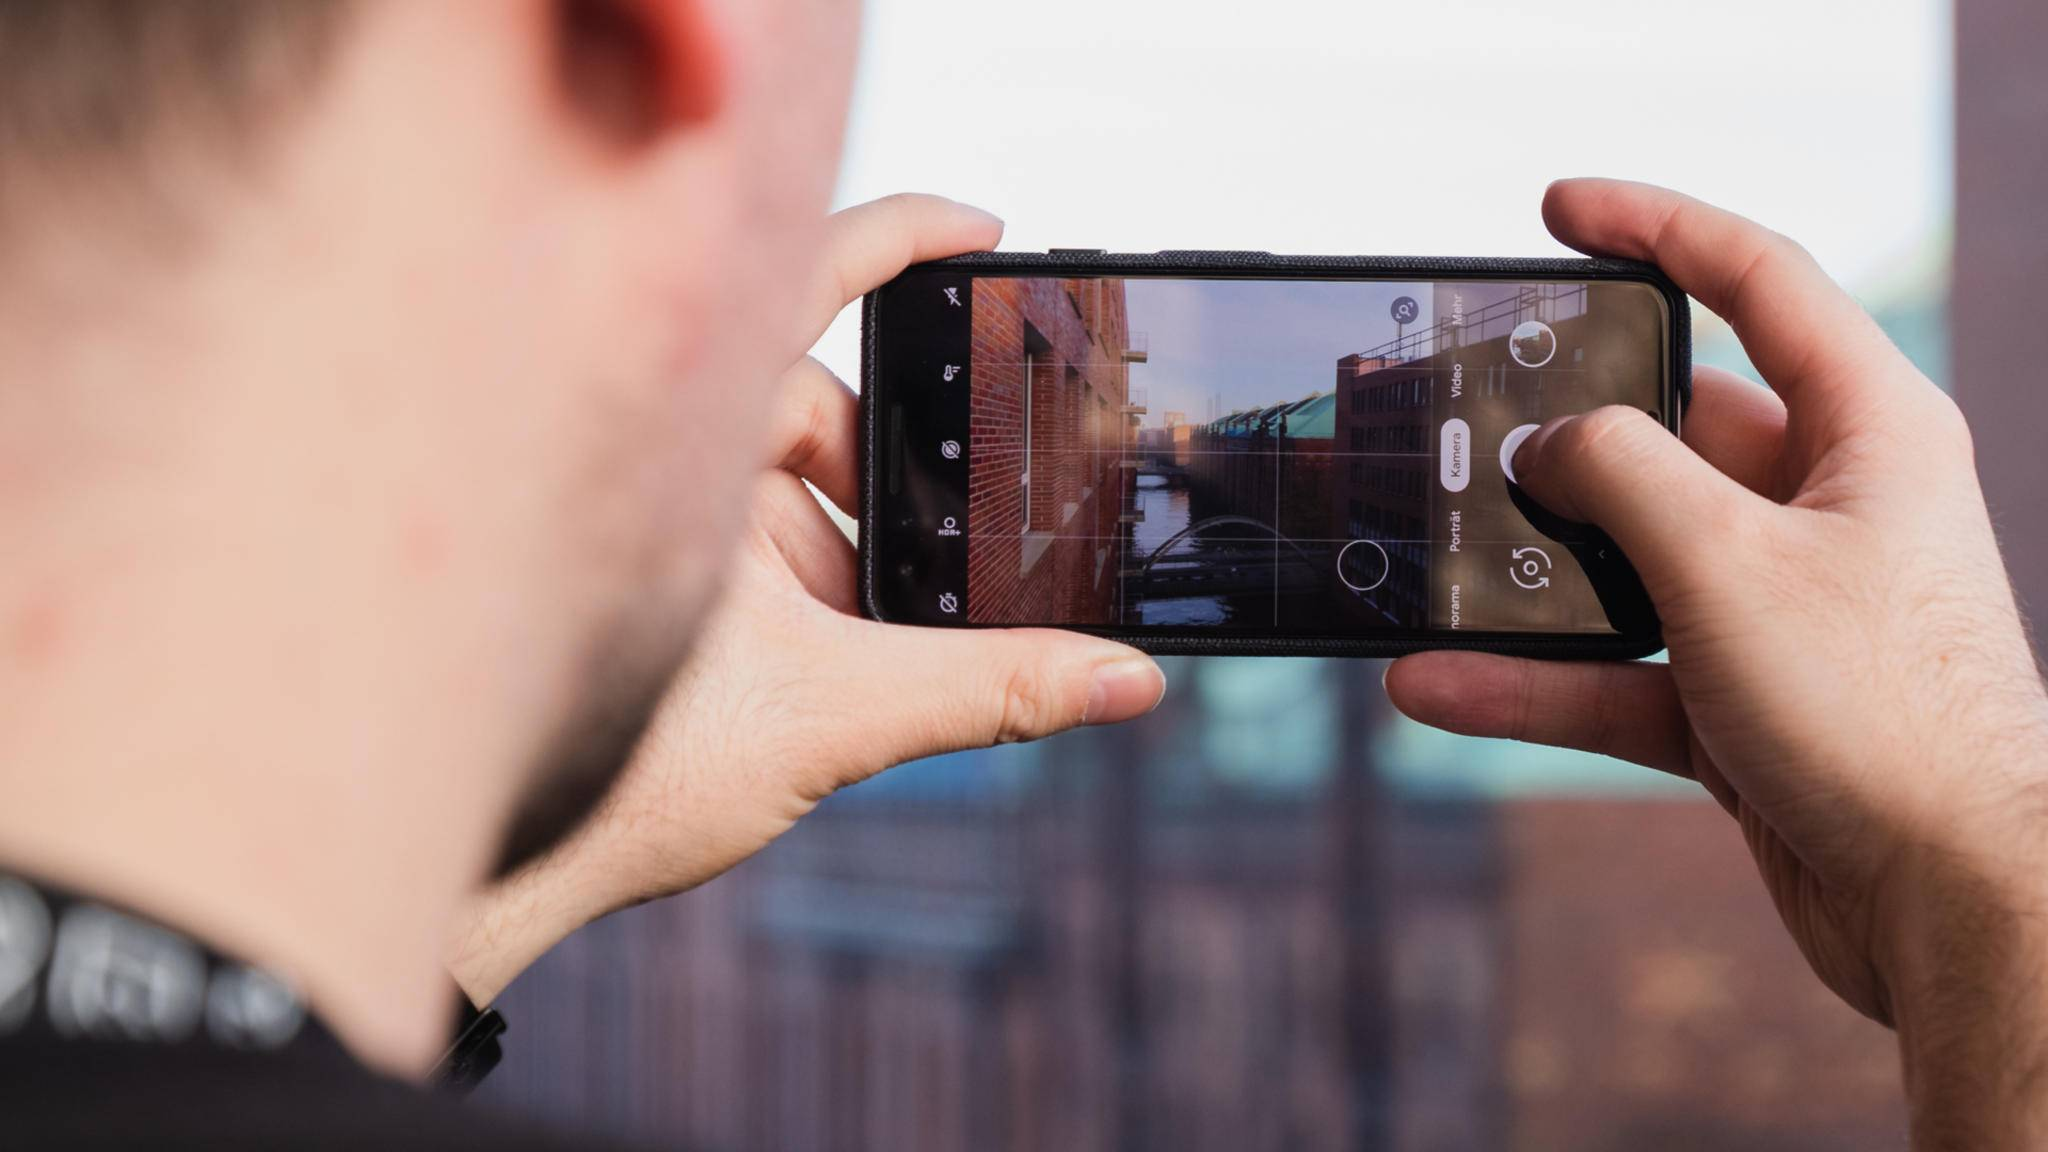 Das beste Single-Lens-Smartphone im Android-Bereich ist laut Expertentest das Google Pixel 3.